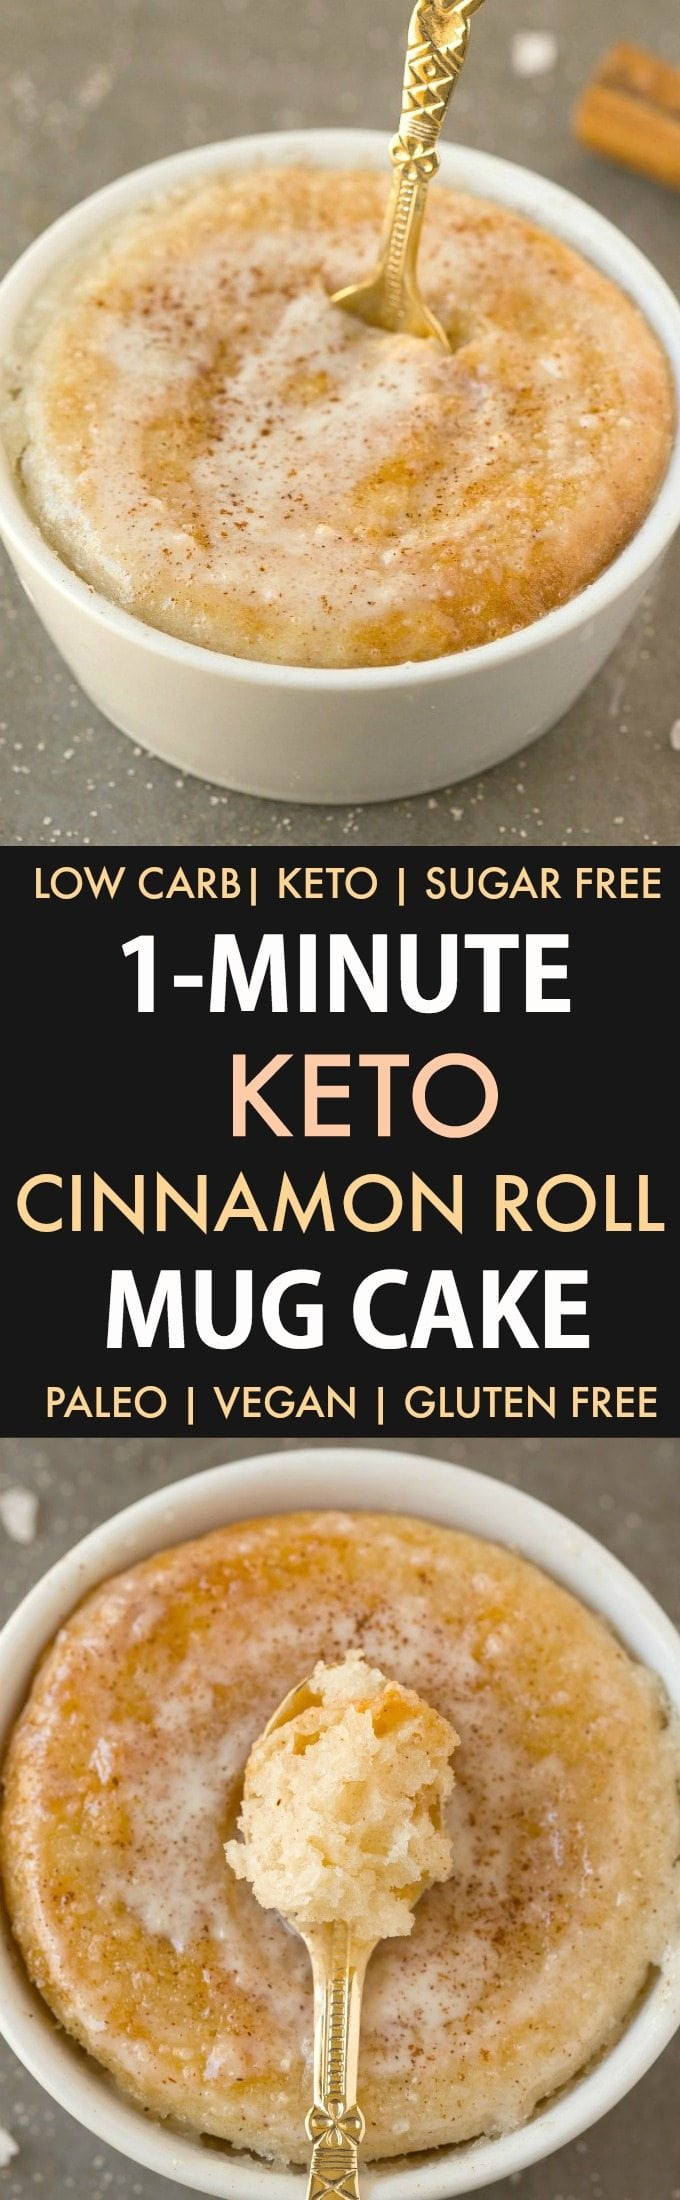 Keto Banana Bread Mug Cake  Healthy 1 Minute Low Carb Keto Mug Cakes Paleo Vegan